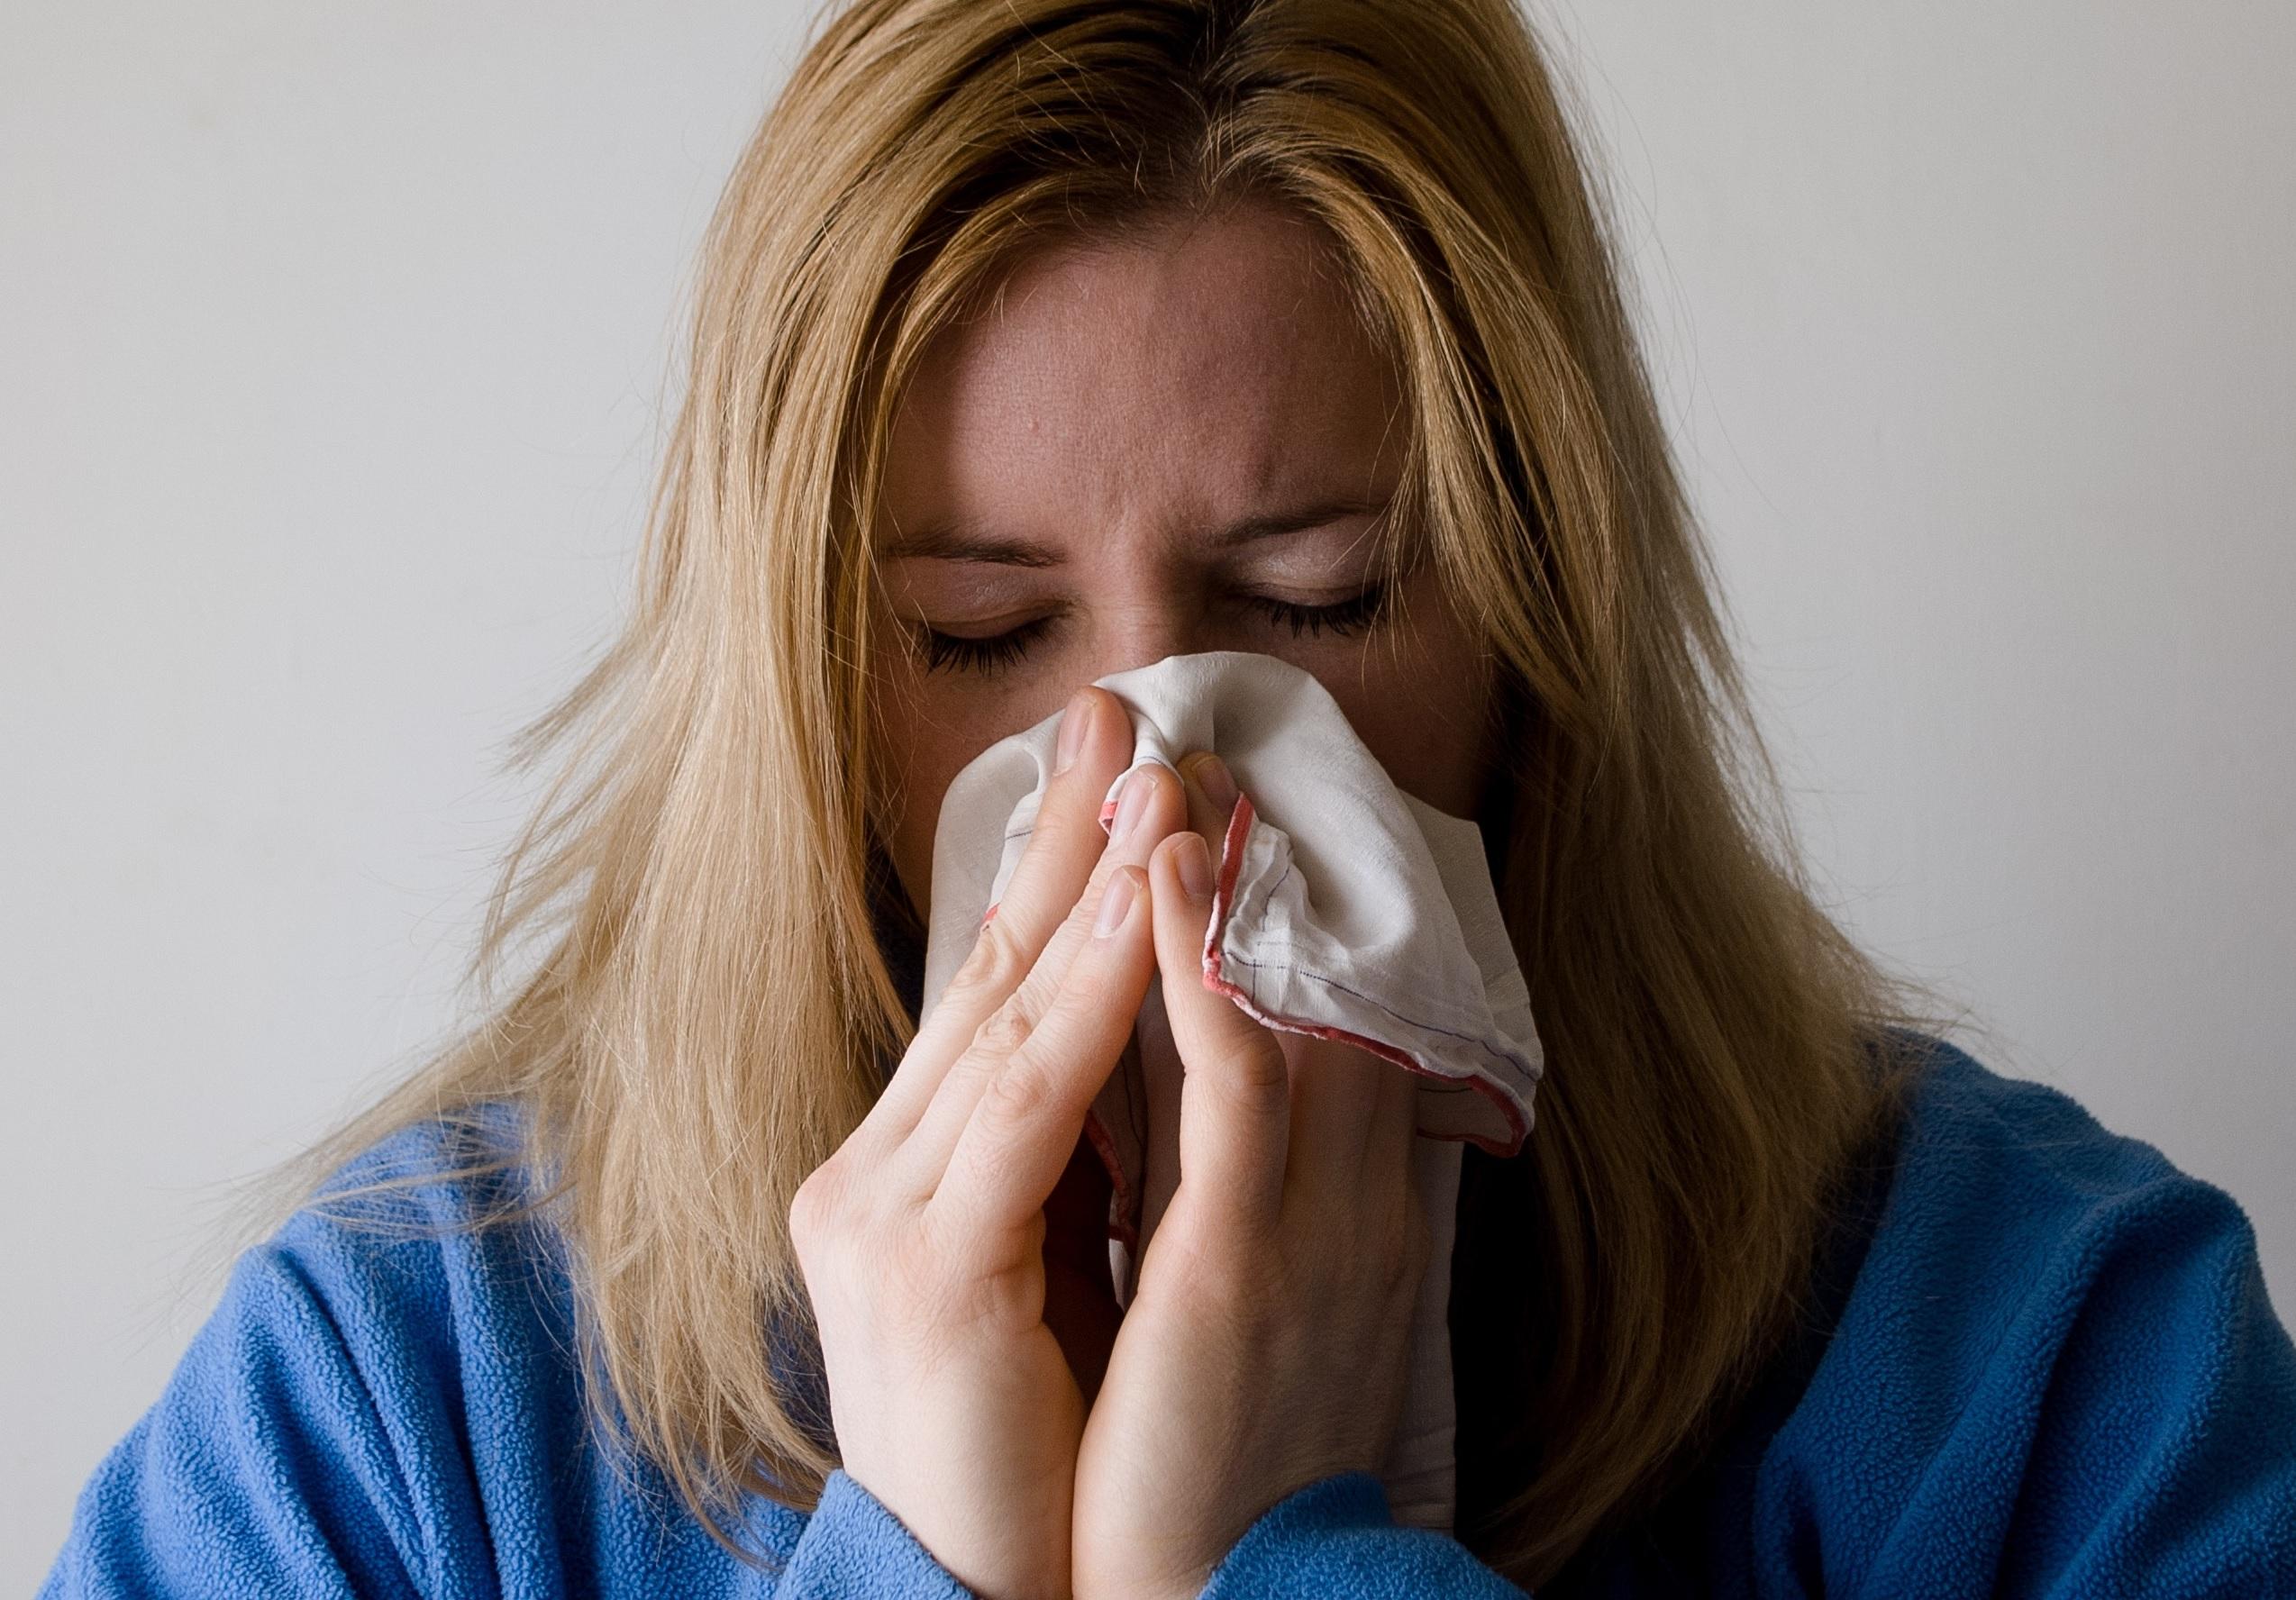 farmacia-beatriz-castellanos-prevenir-resfriado-gripe